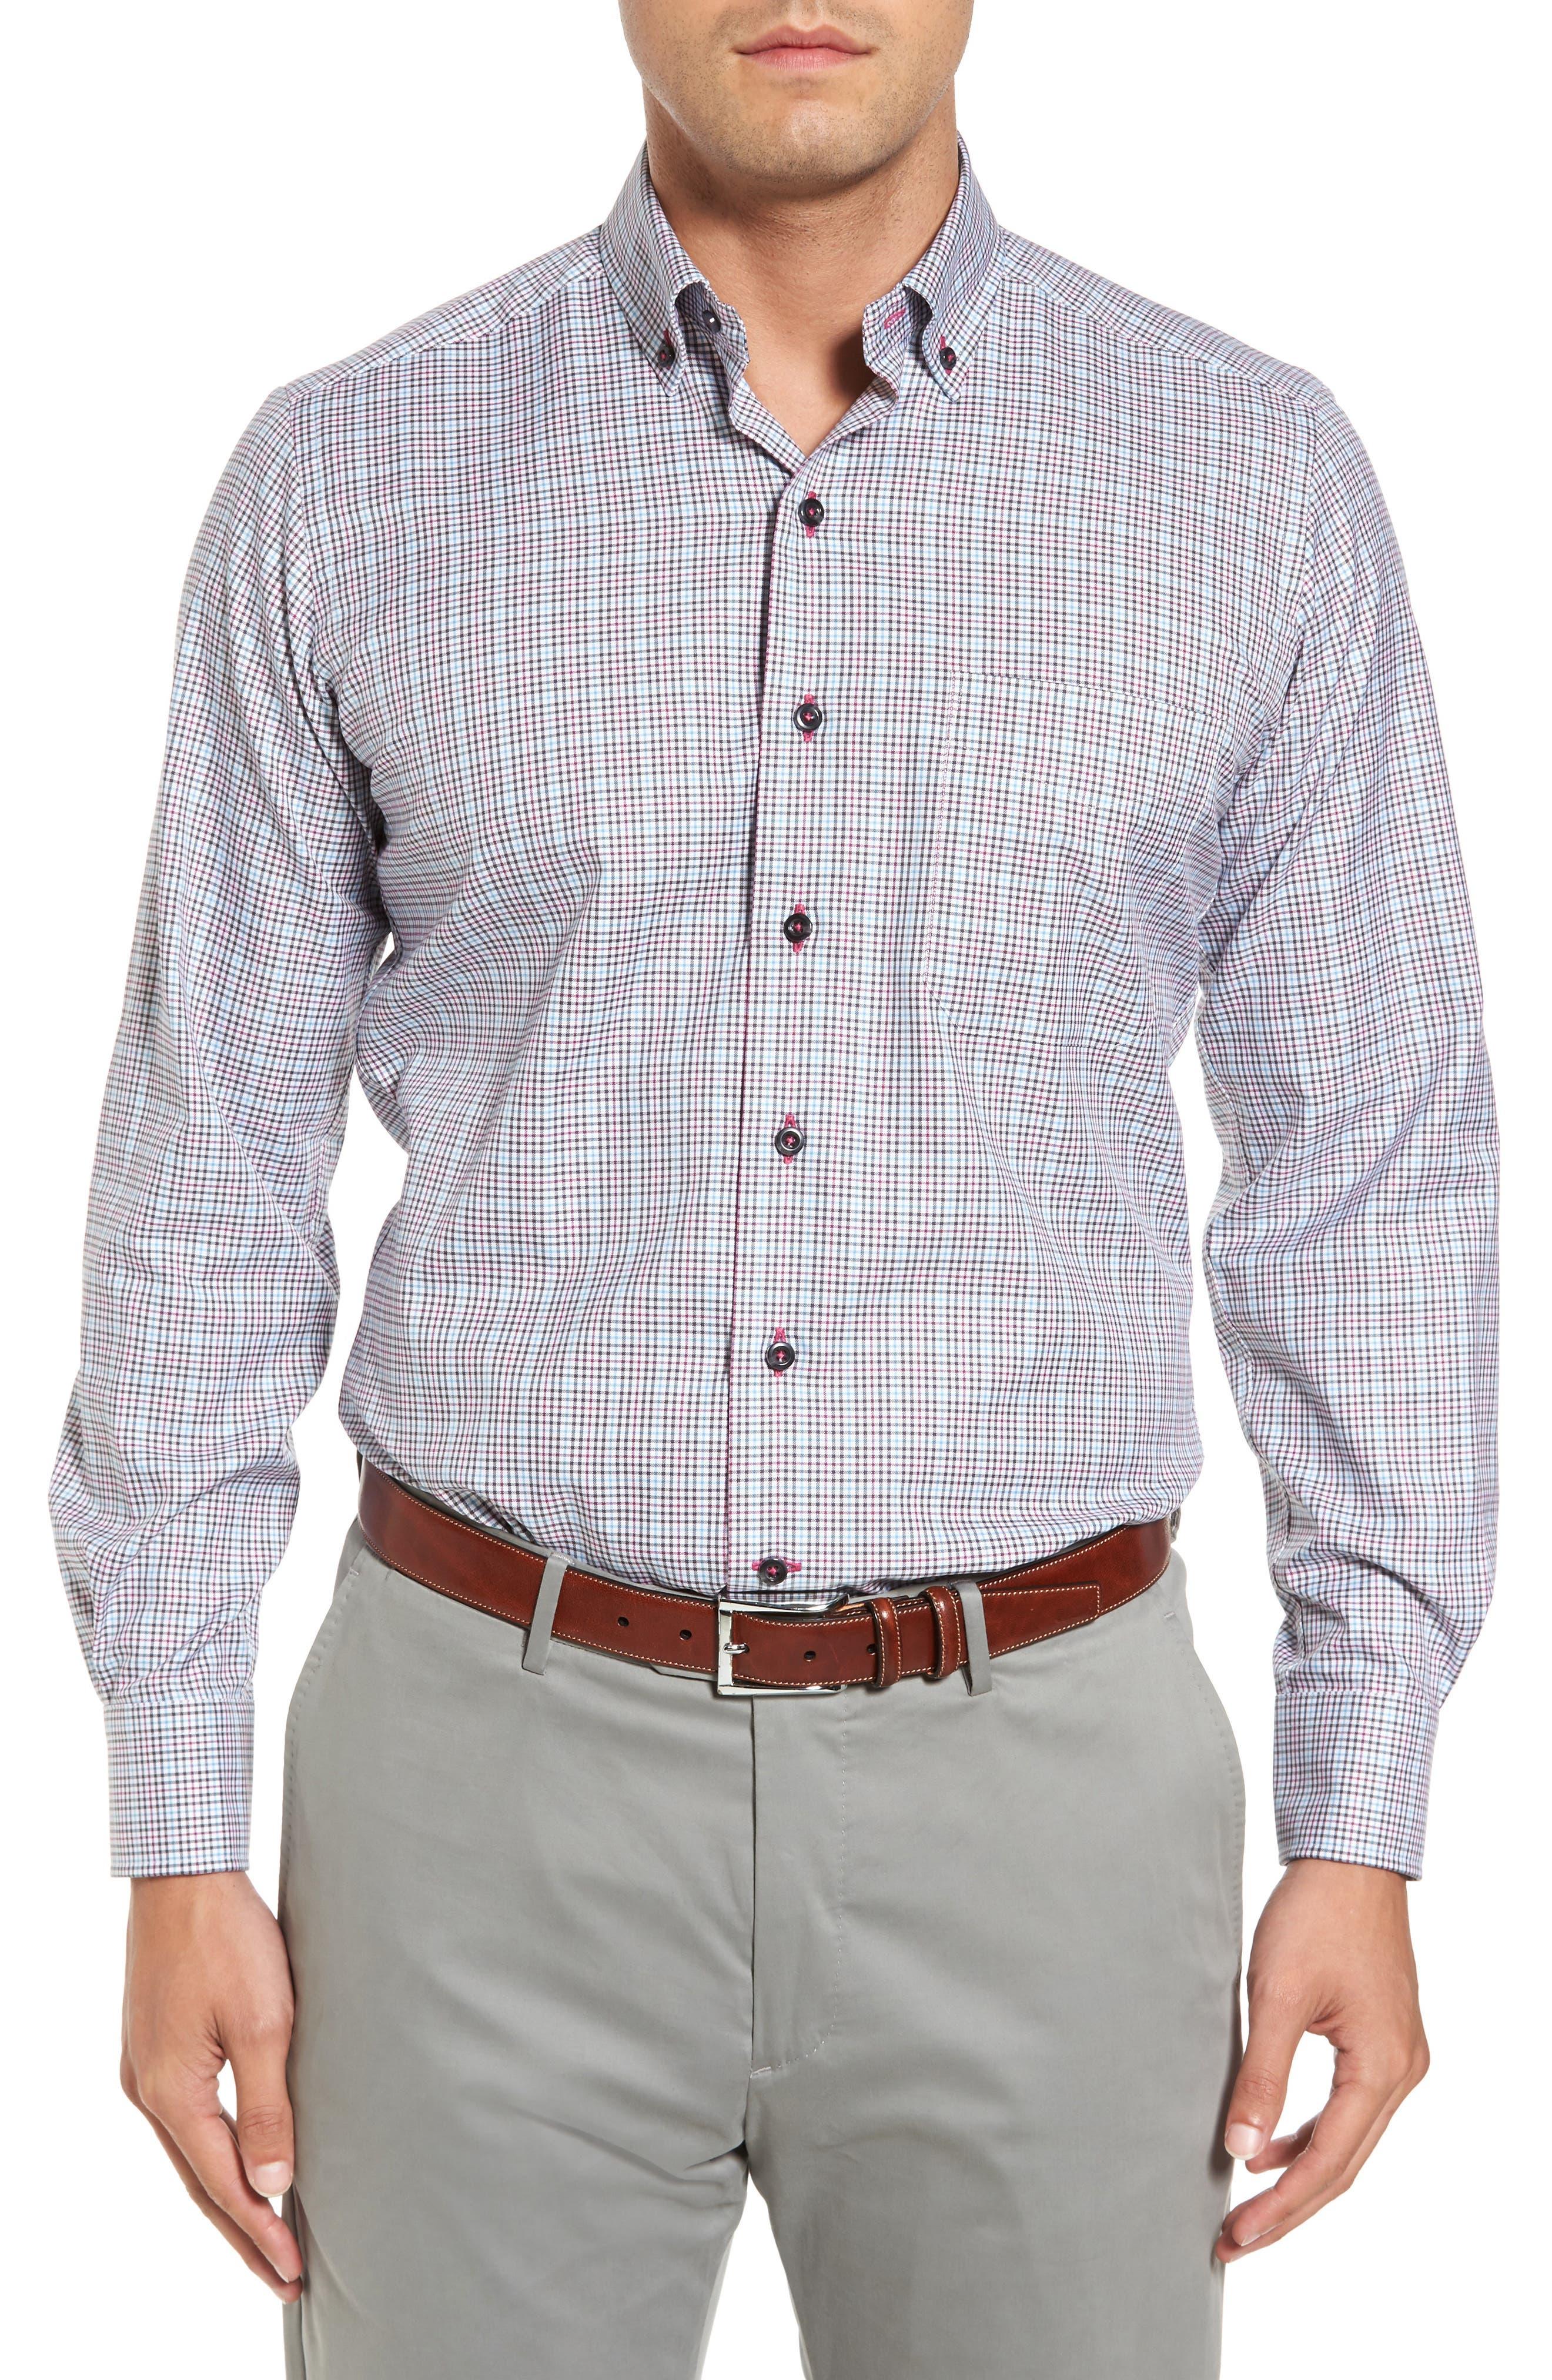 Regular Fit Plaid Sport Shirt,                         Main,                         color, 020